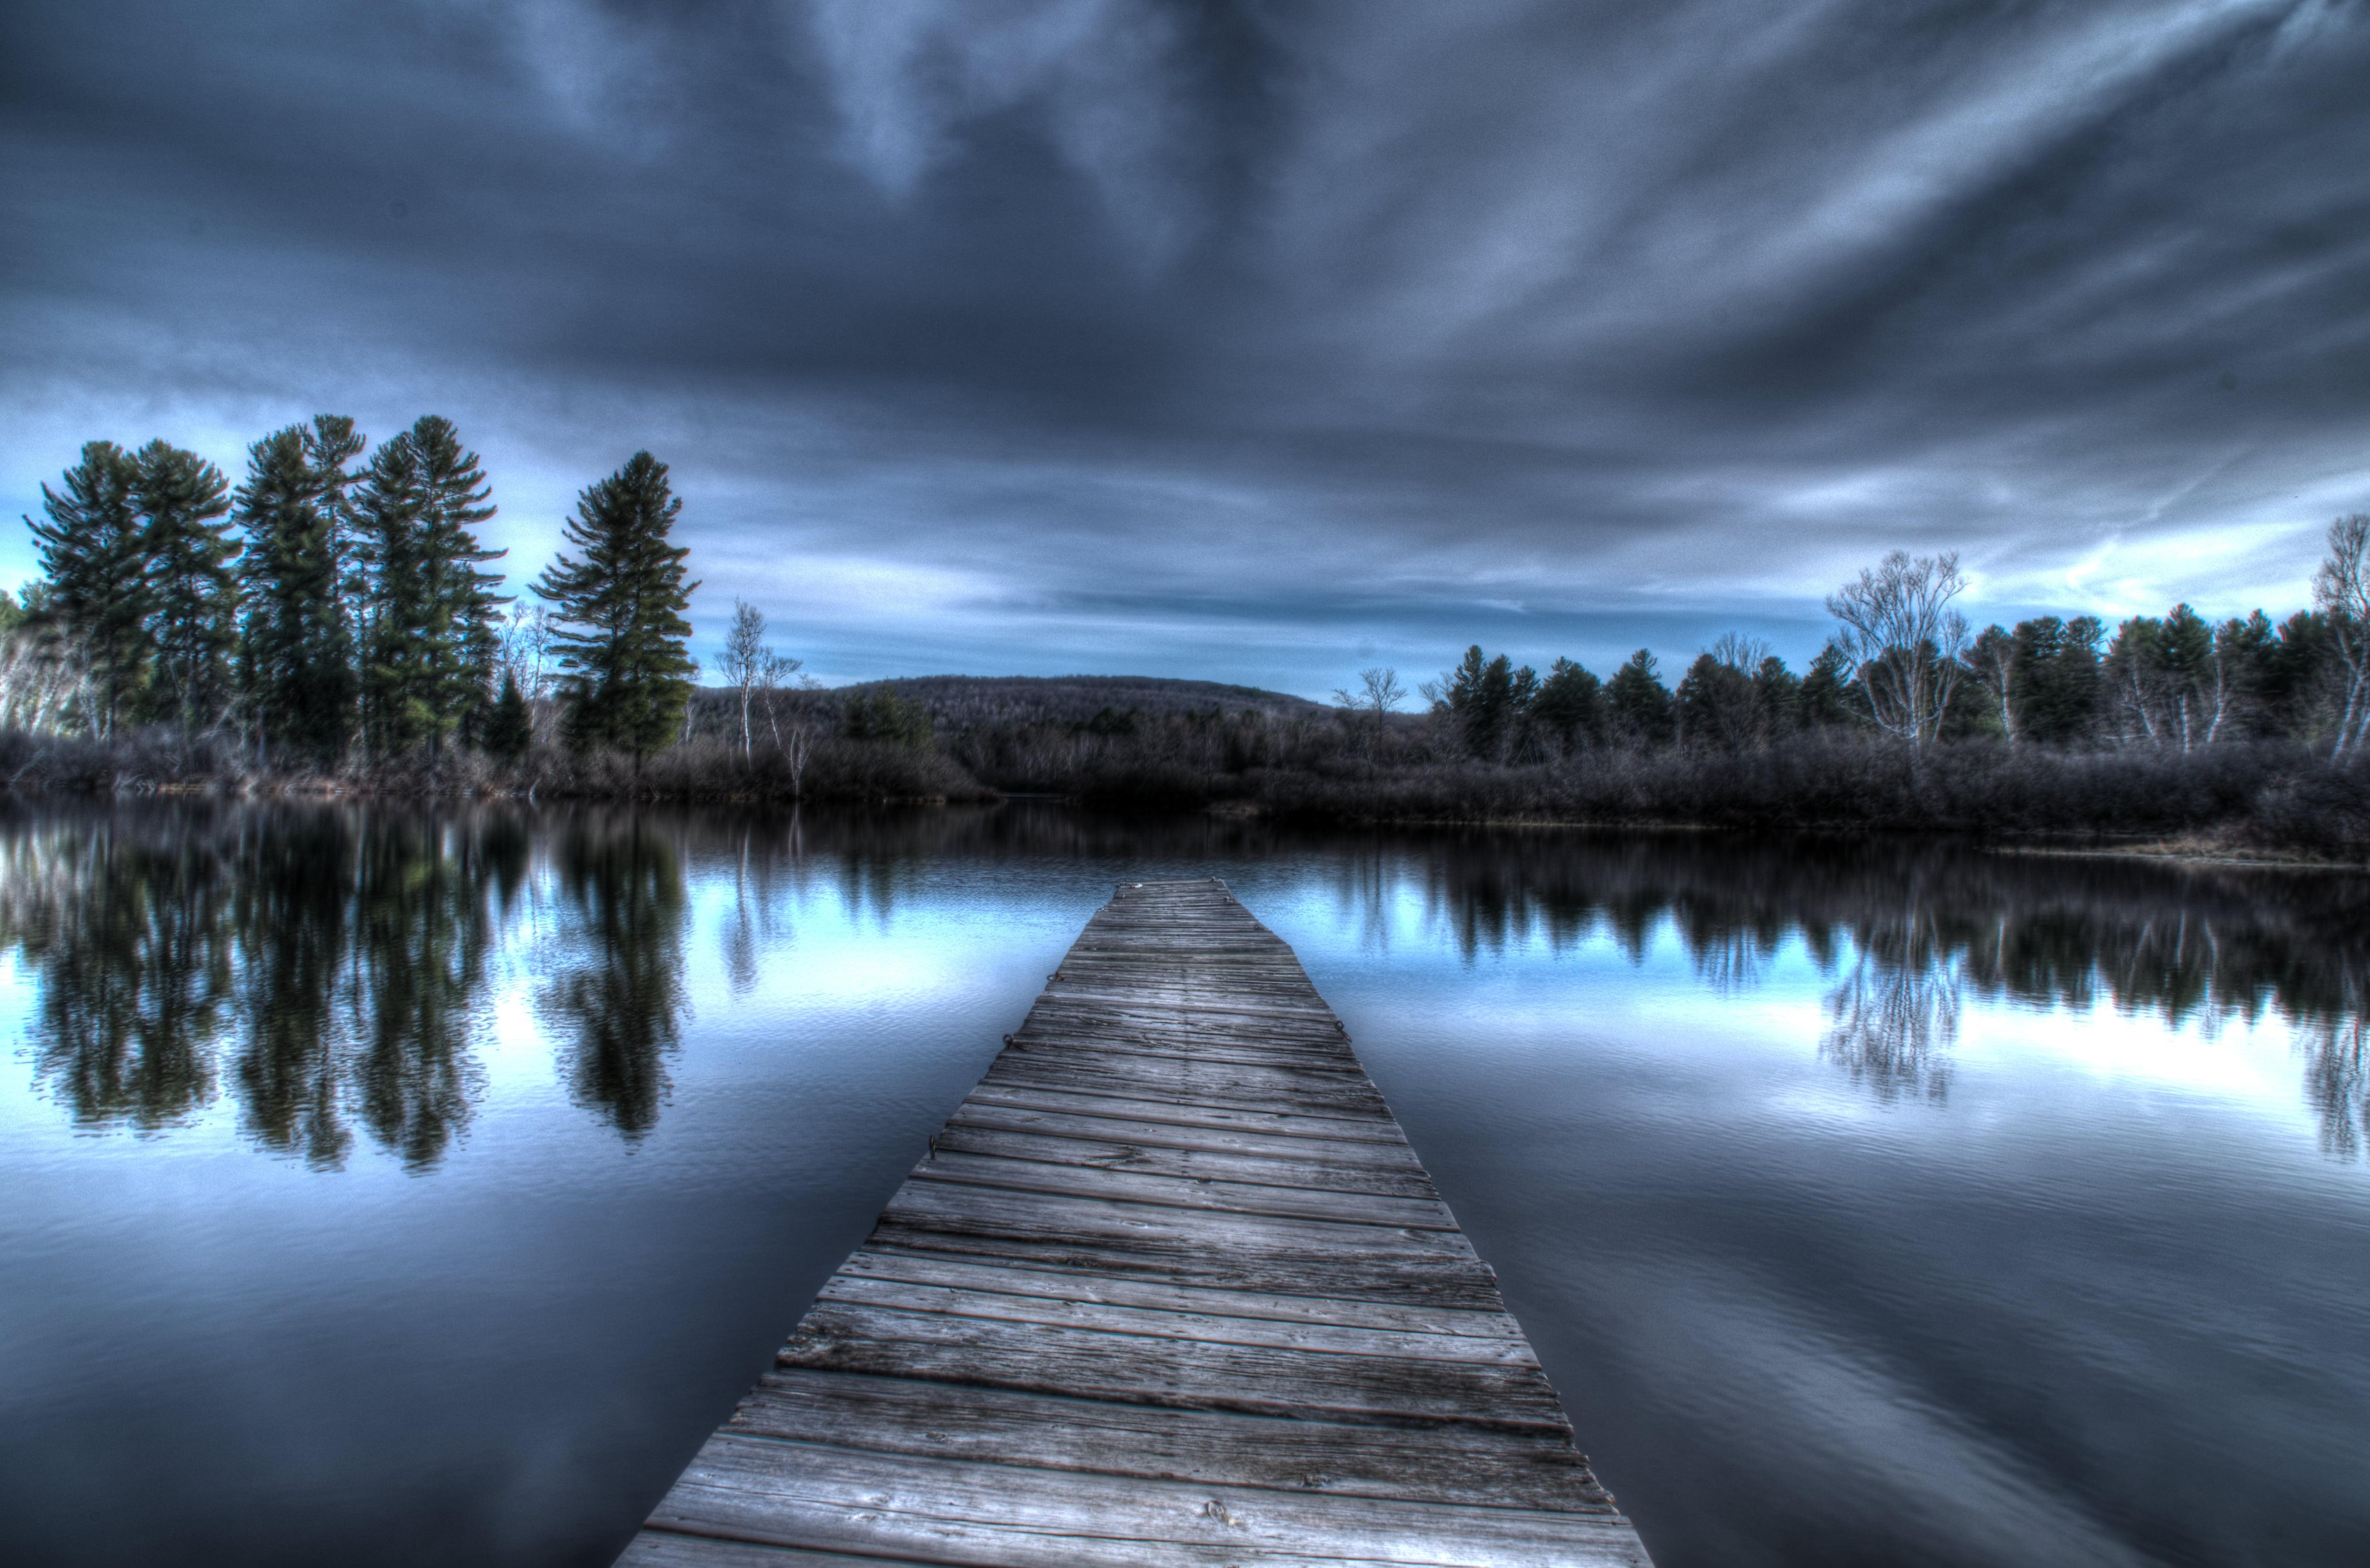 Black and gray wooden bridge near body of water HD wallpaper ...